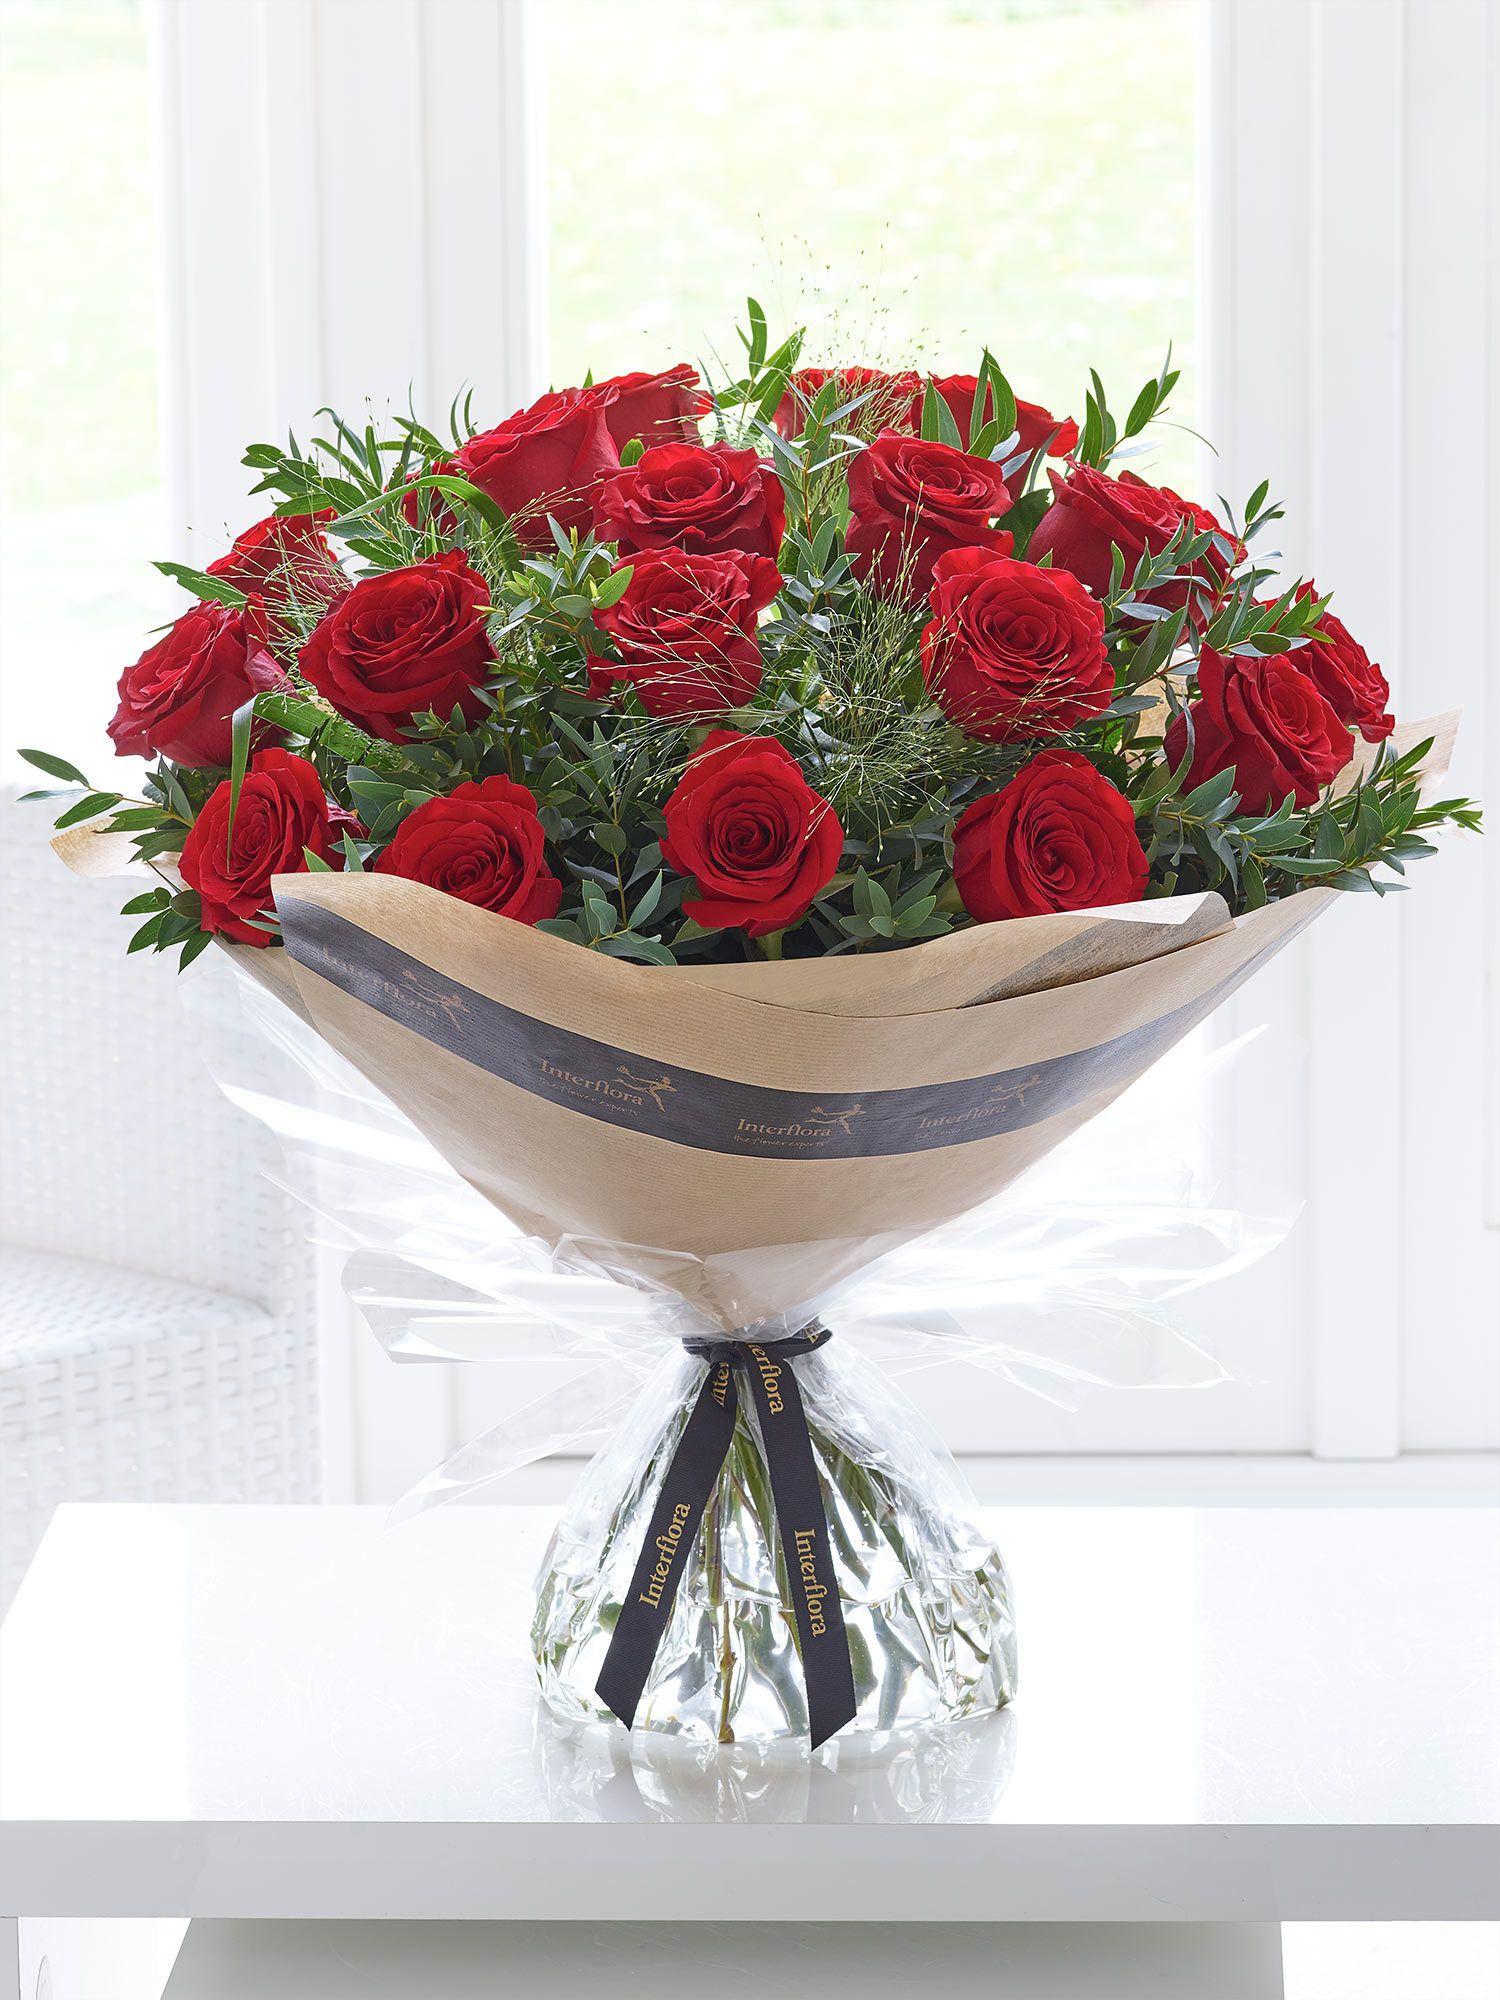 Heartfelt 20 Rose Hand tied Rodgers The Florist